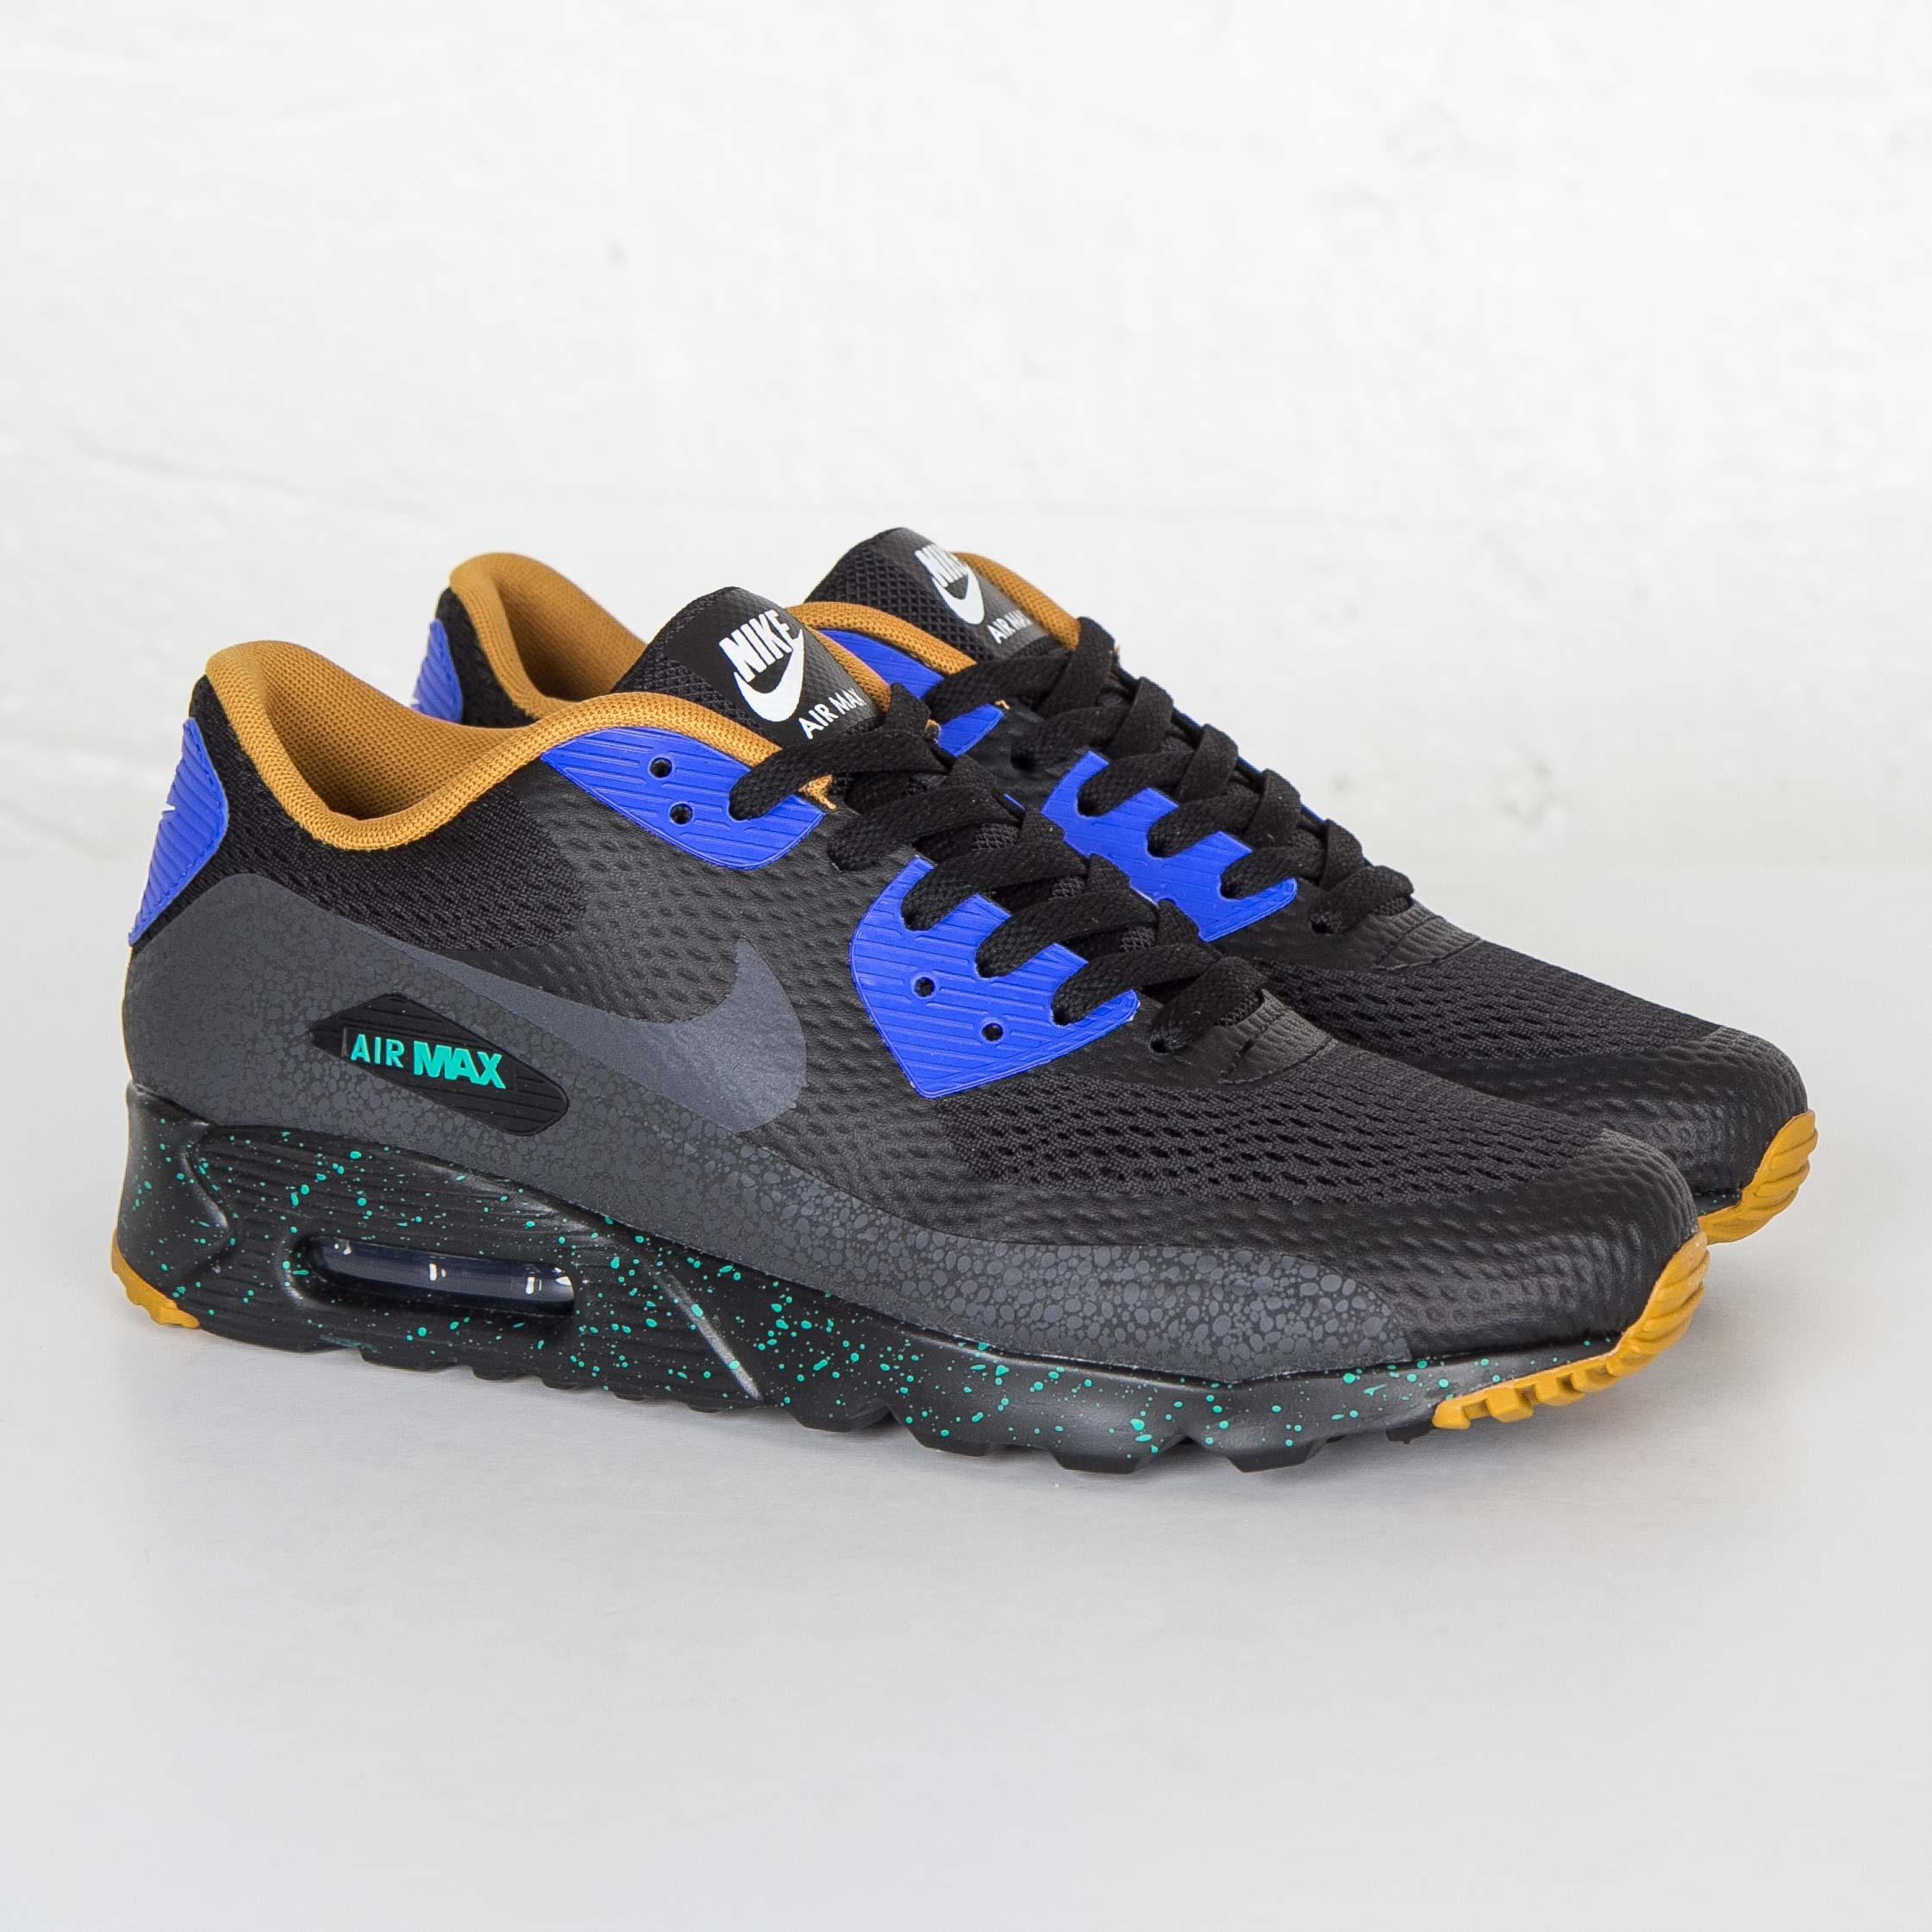 Específico Murciélago empeñar  Nike Air Max 90 Ultra Essential - 819474-004 - Sneakersnstuff | sneakers &  streetwear online since 1999